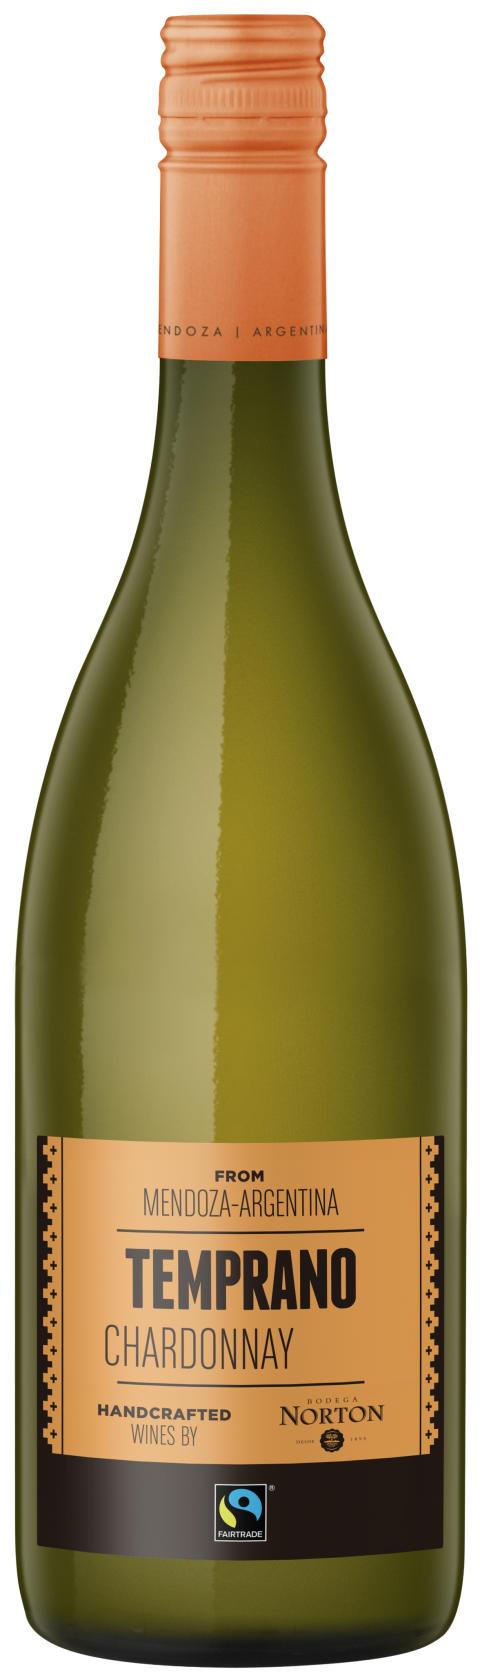 Temprano Chardonnay